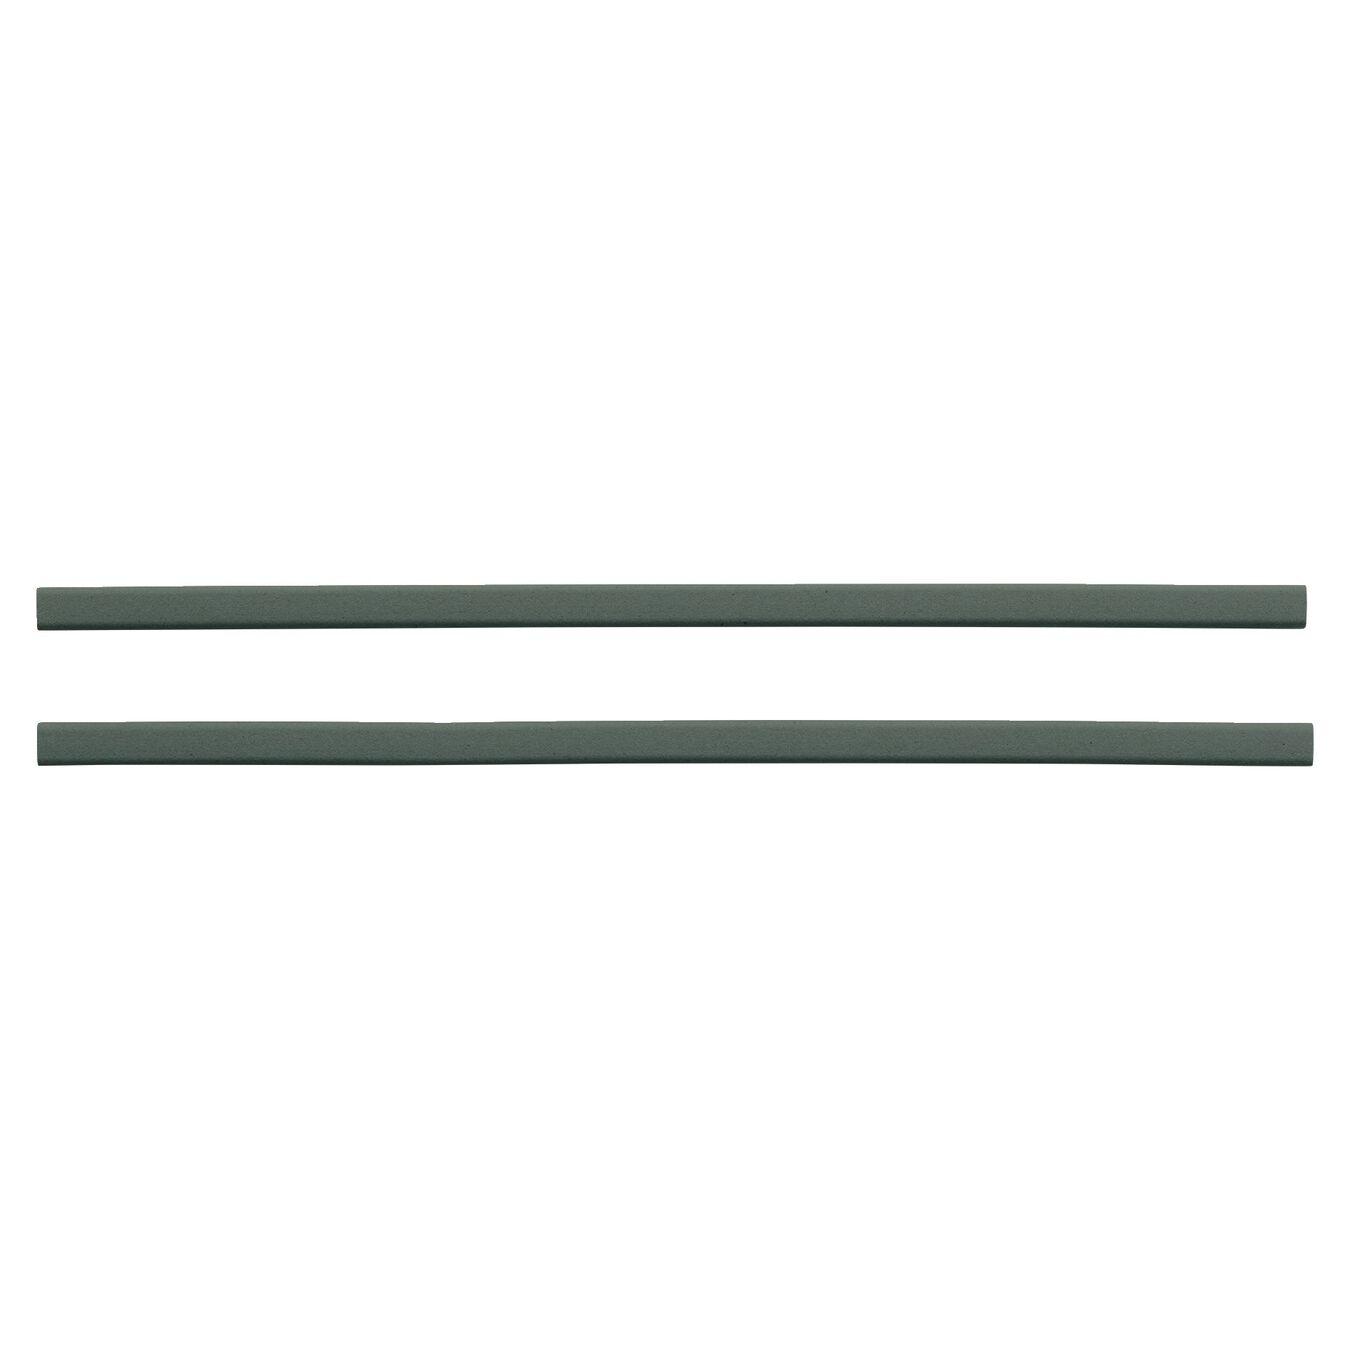 Affilacoltelli - 8 cm, ABS, nero,,large 4